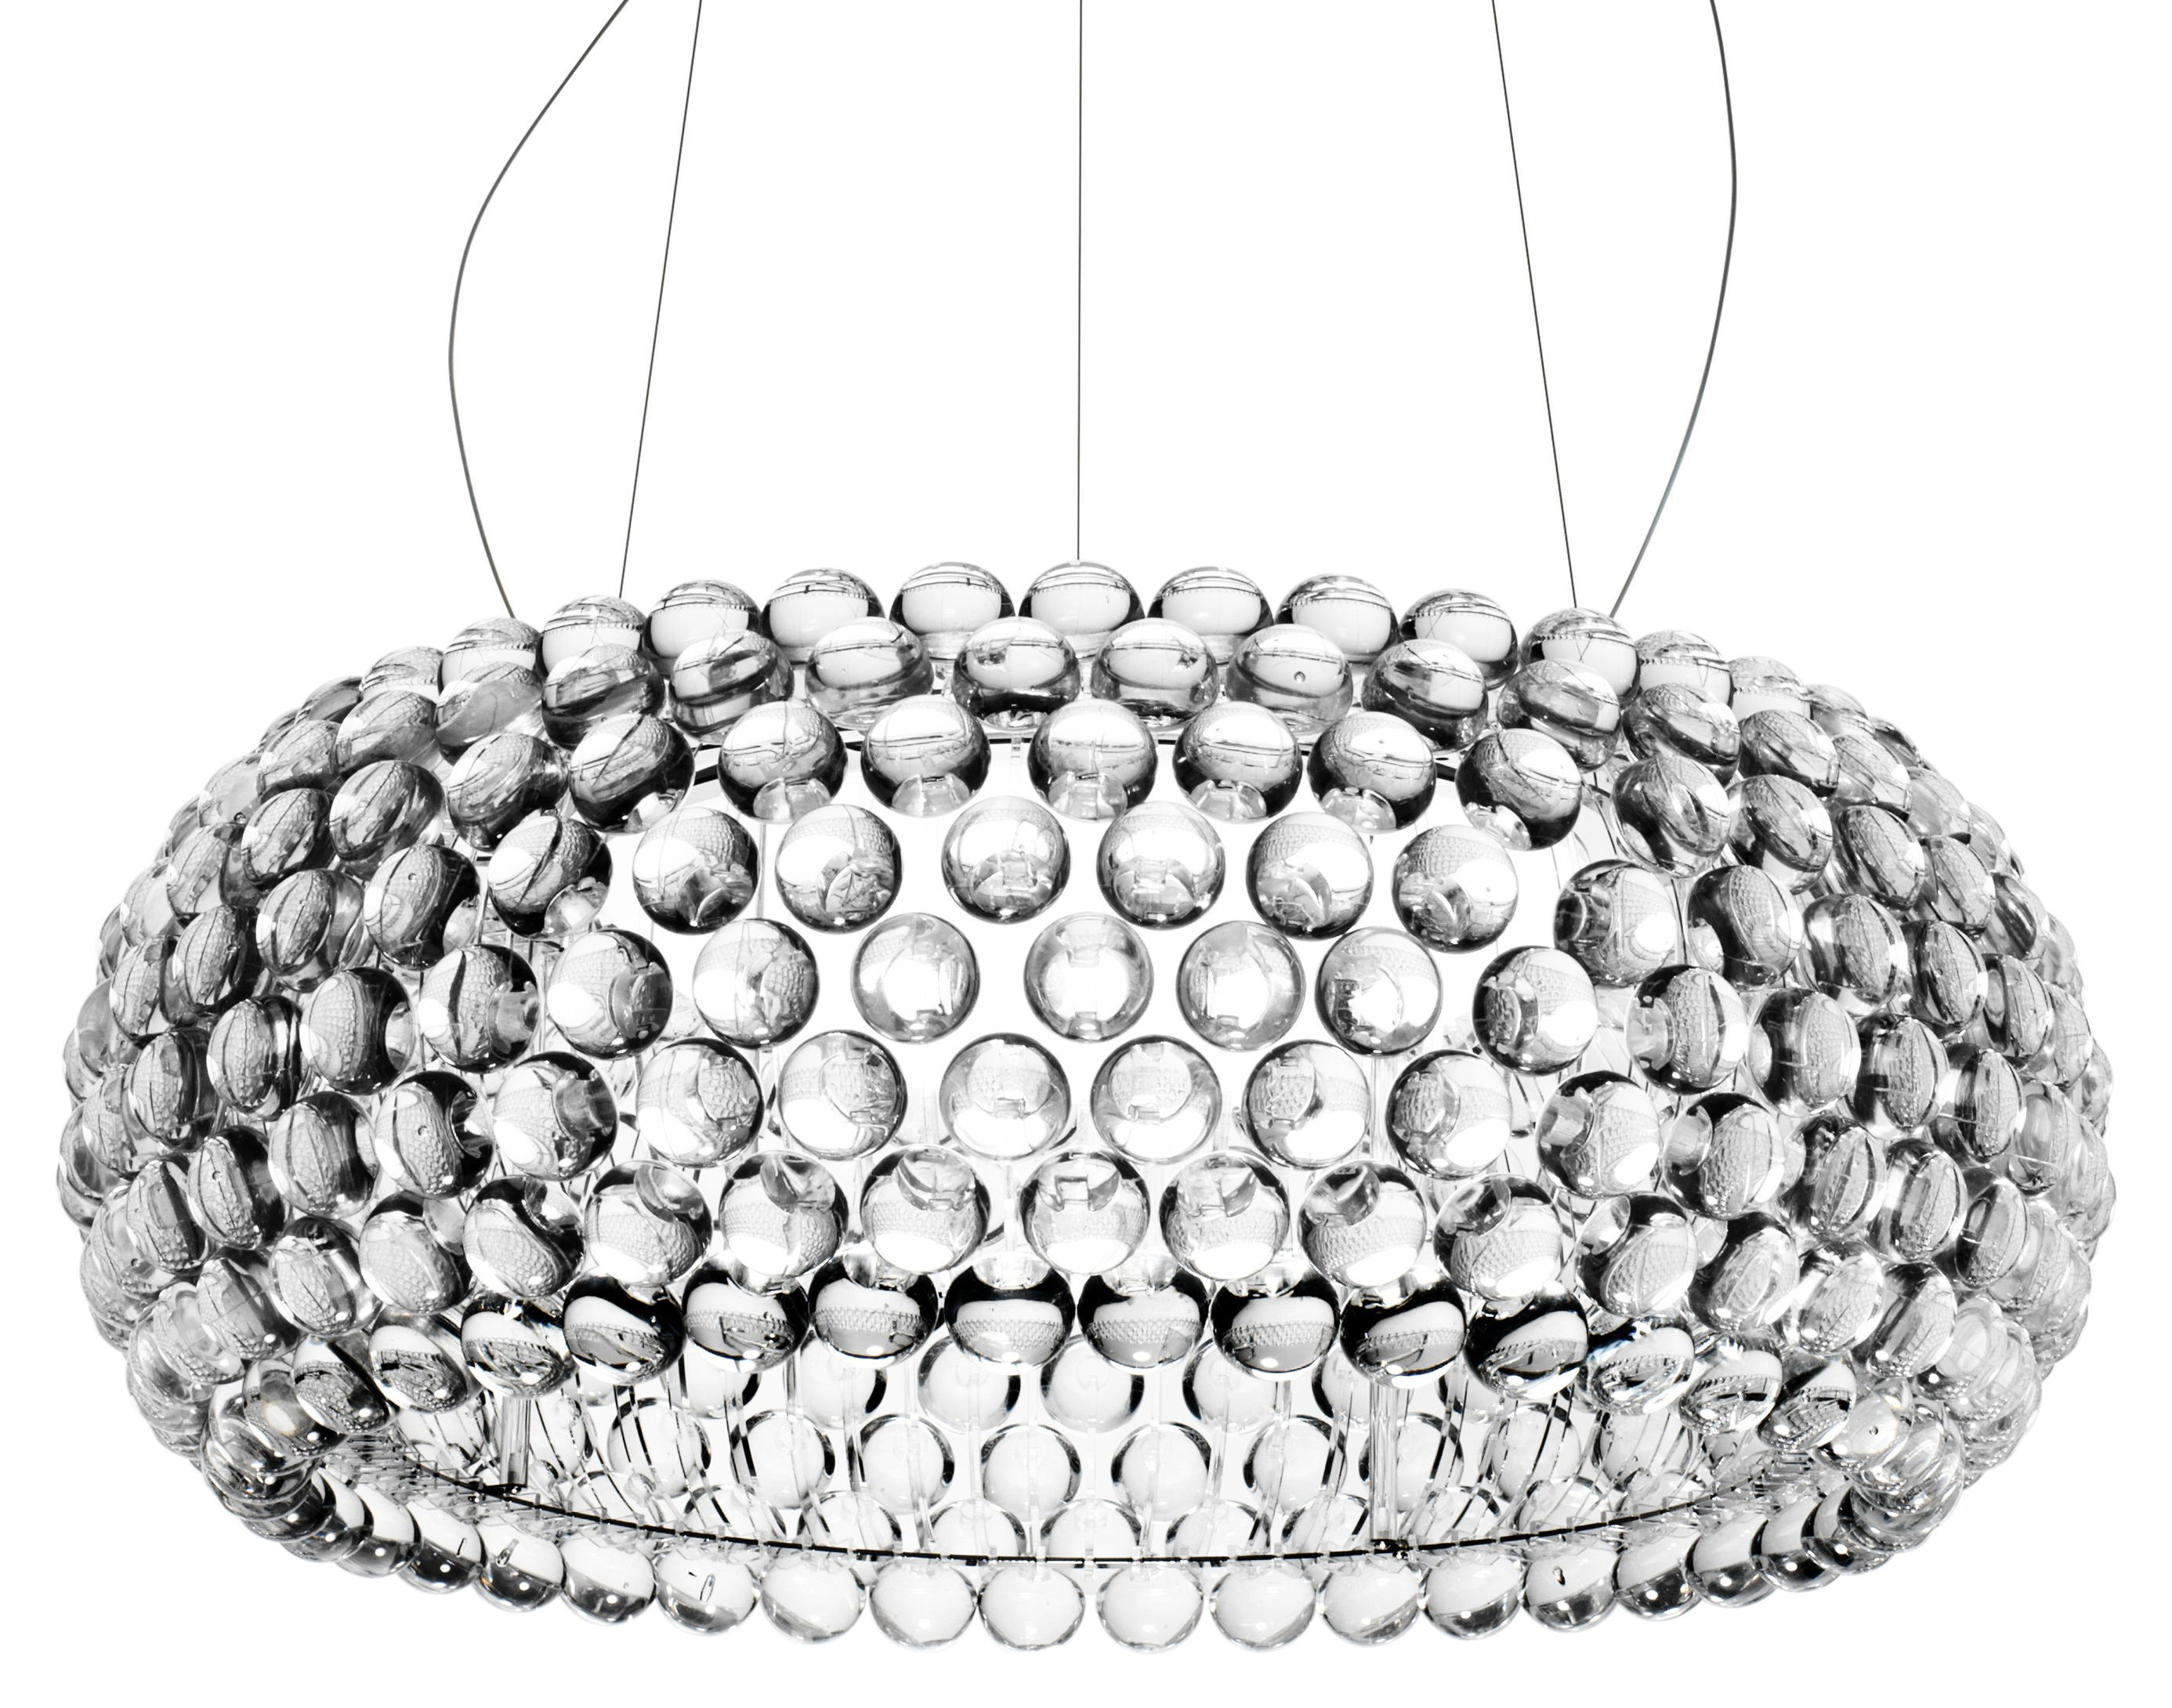 Leuchten - Pendelleuchten - Caboche Grande Pendelleuchte LED / Ø 70 cm - Foscarini - Transparent - Glas, Metall, PMMA